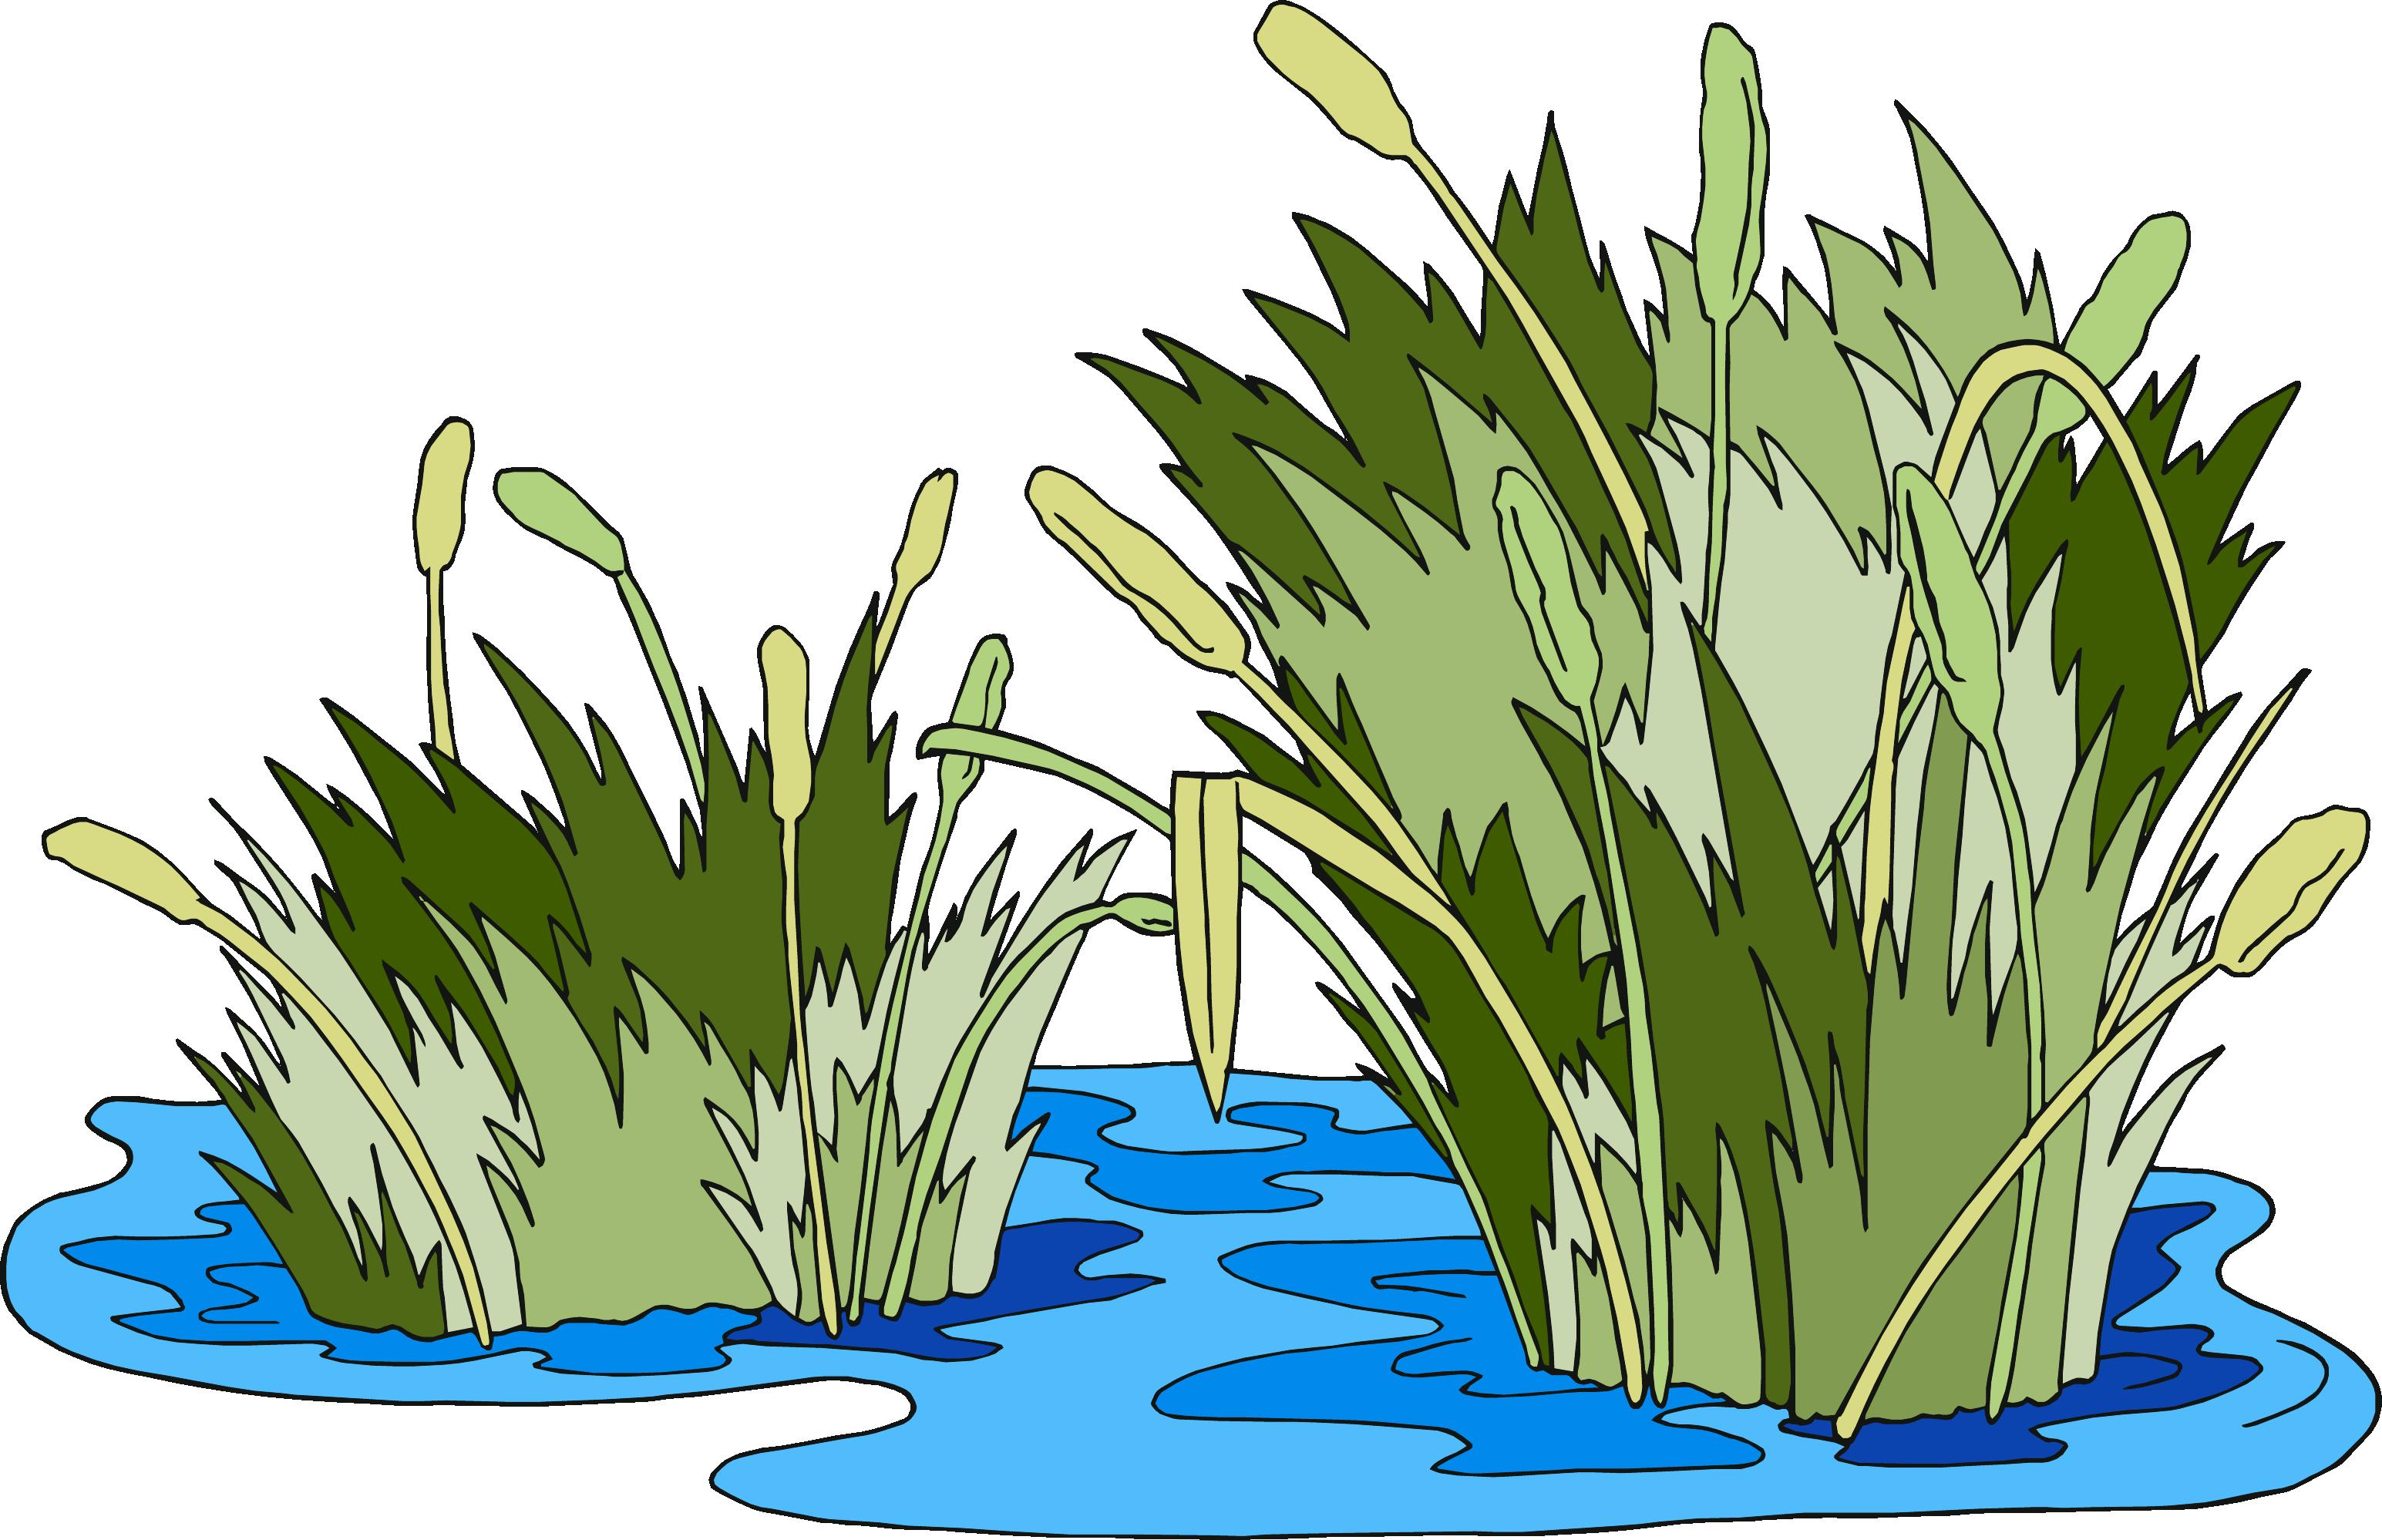 Surviving the jungle vbs. Clipart grass marsh